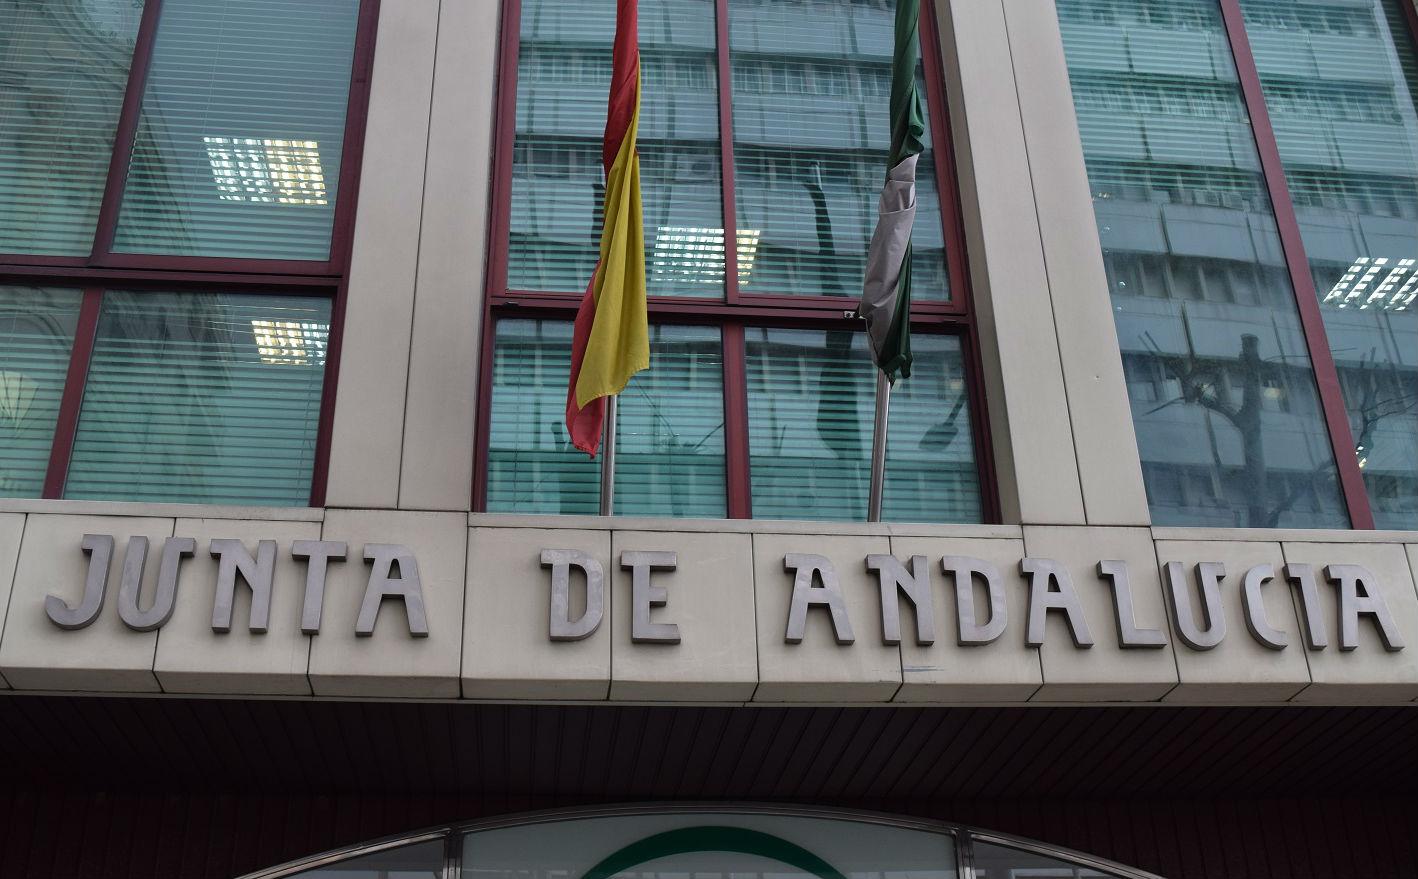 oposiciones a administrativo junta de andalucia